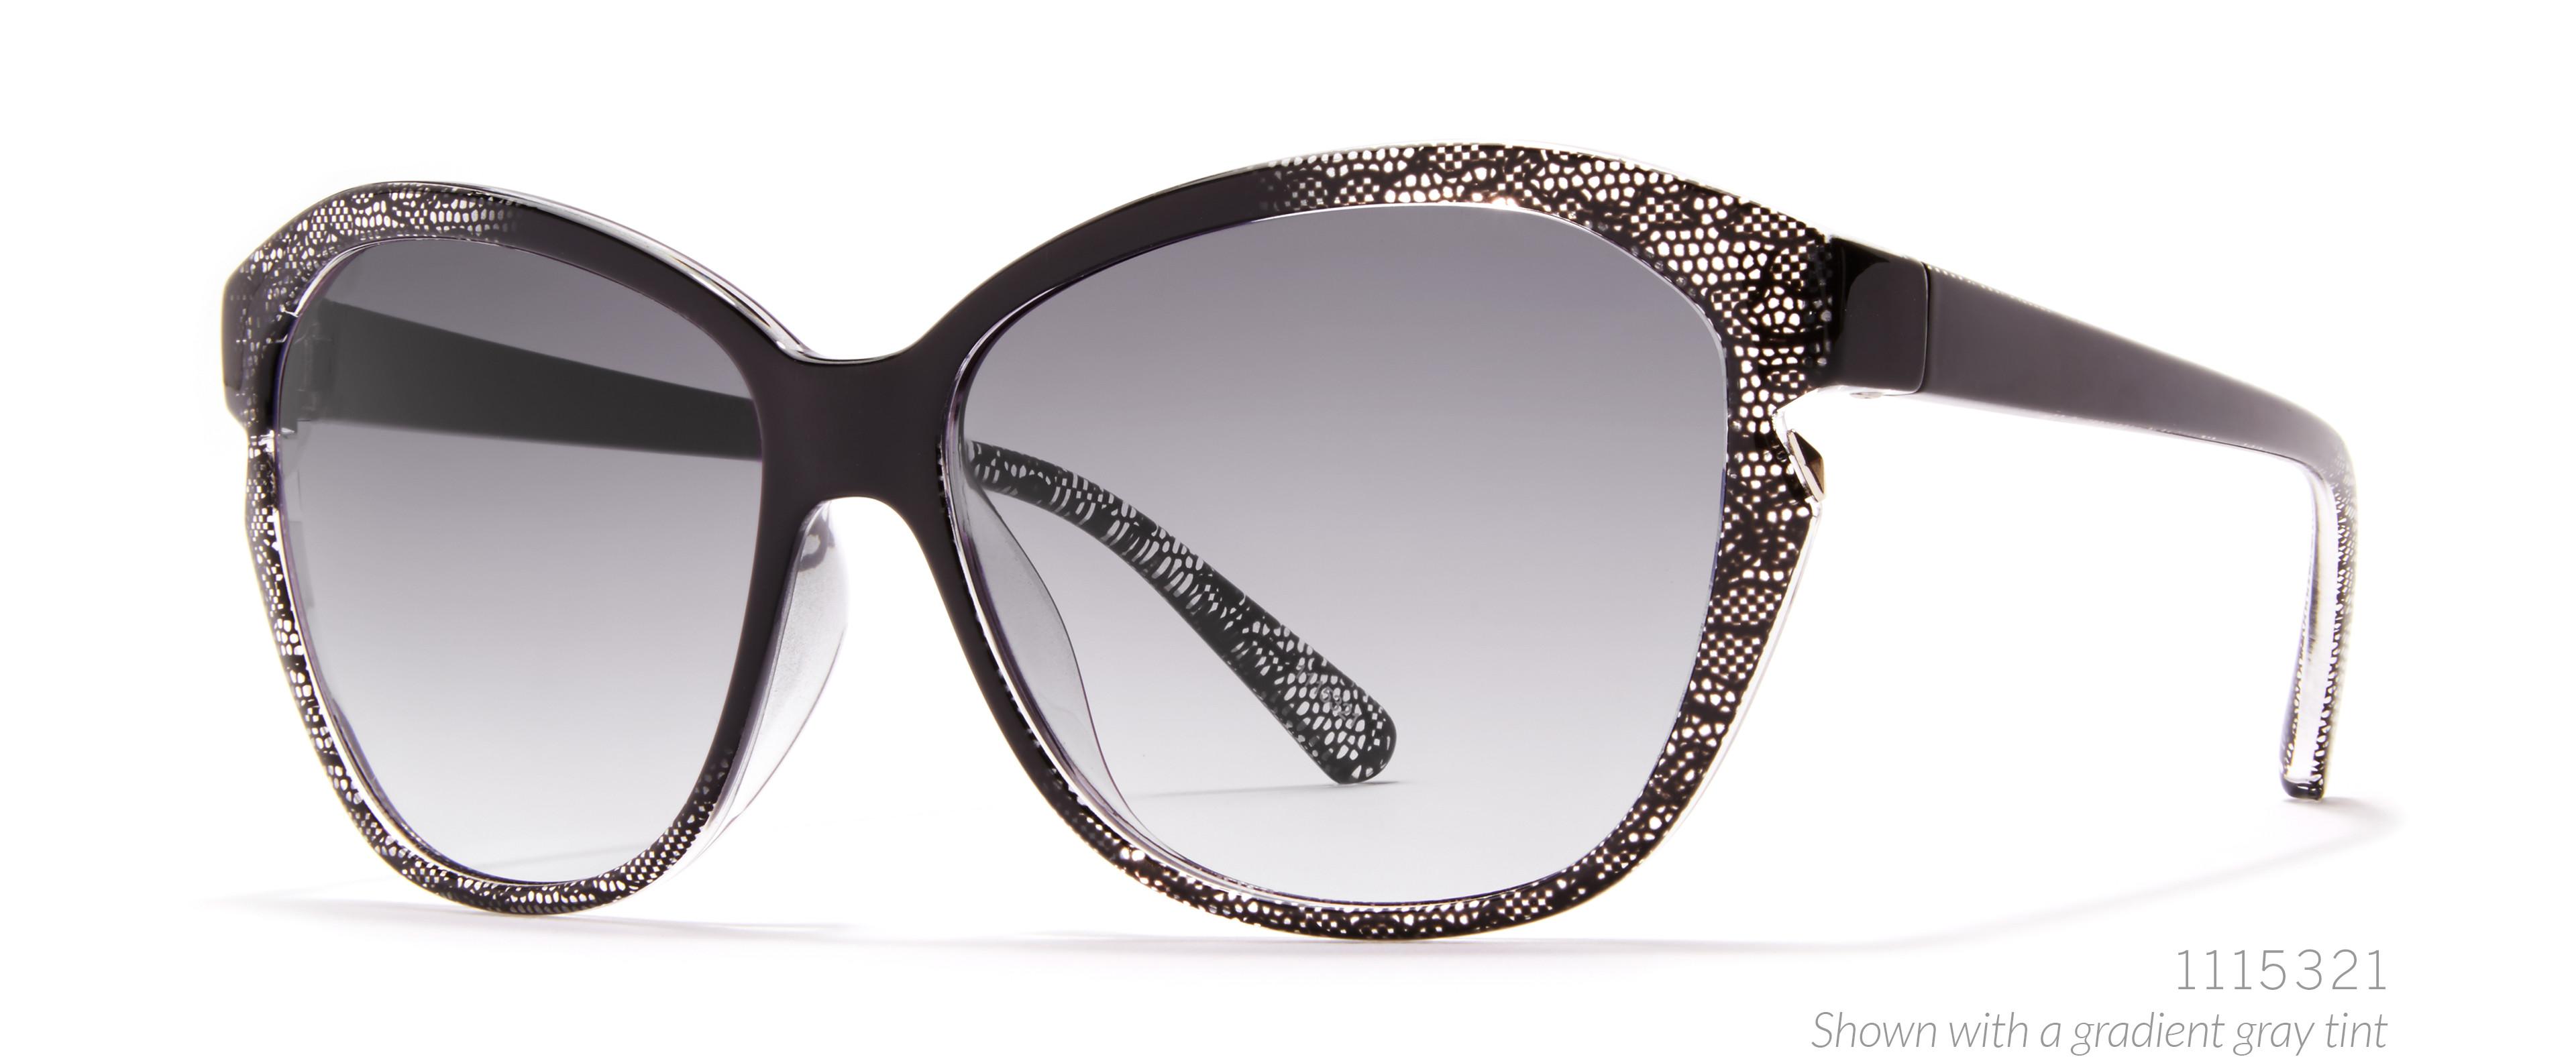 oversized-black-and-white-sunglasses